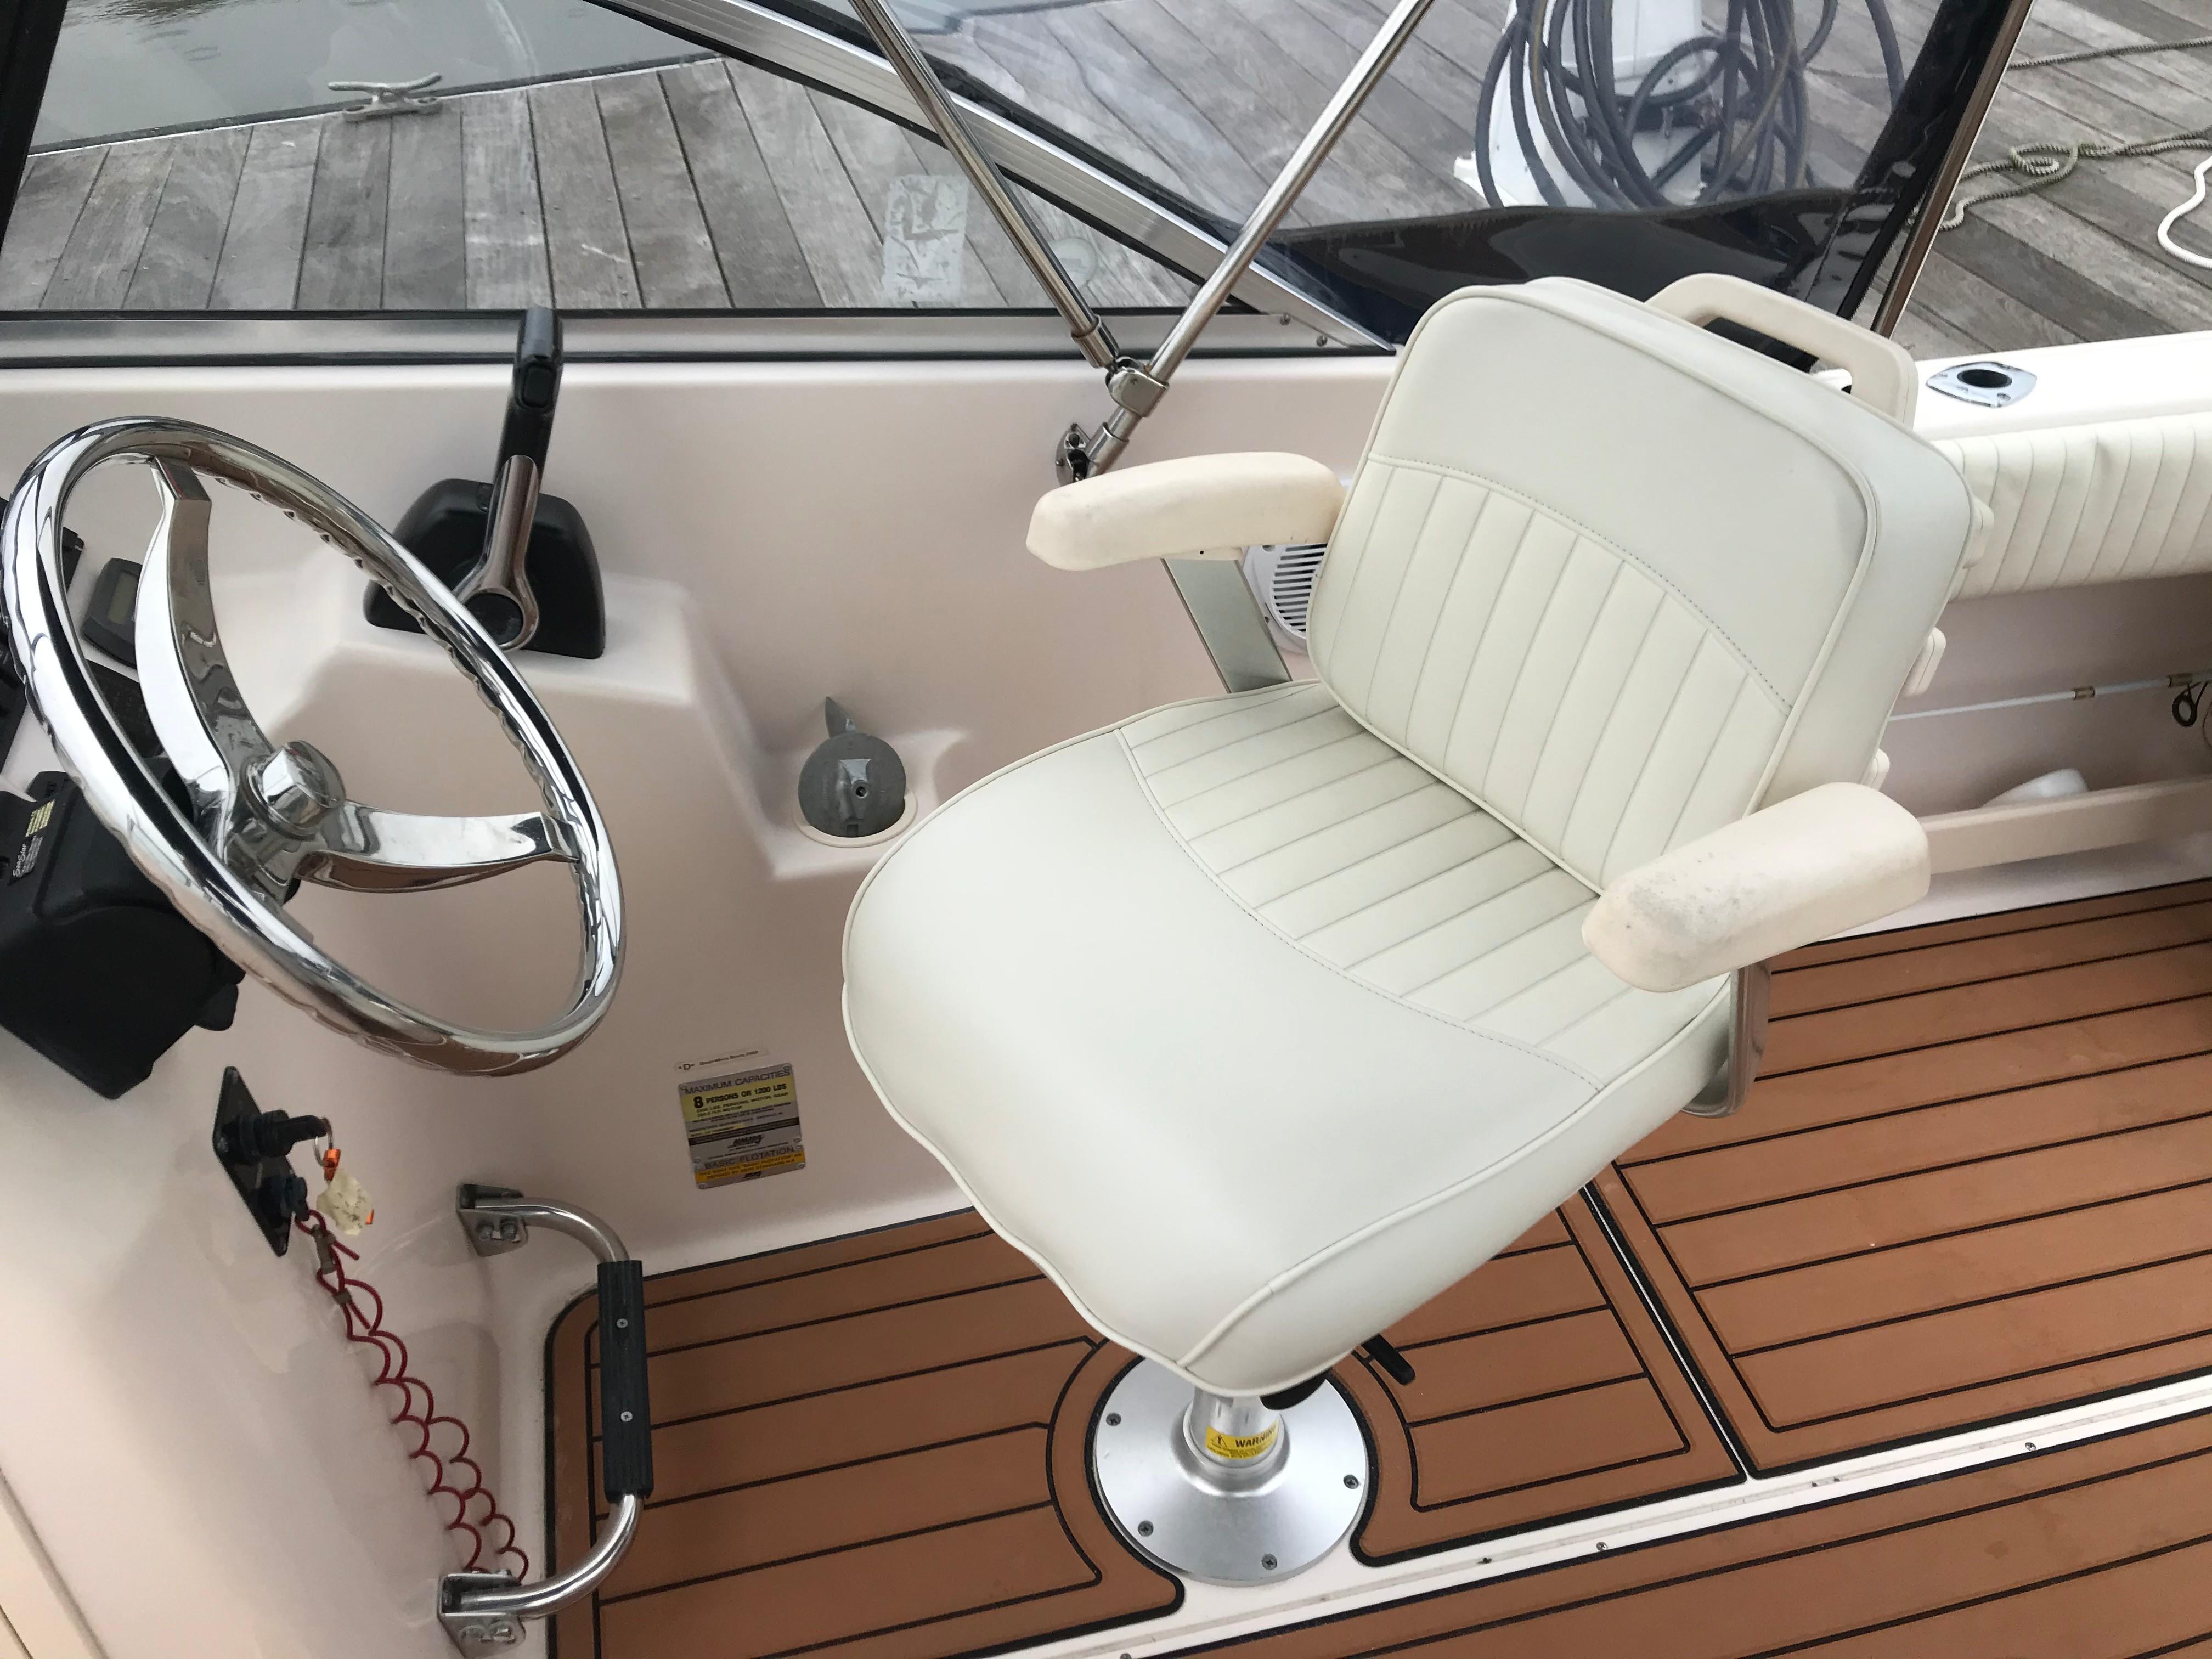 Grady-white 225 Tournament Dual Console - Pedistal Helm Seat